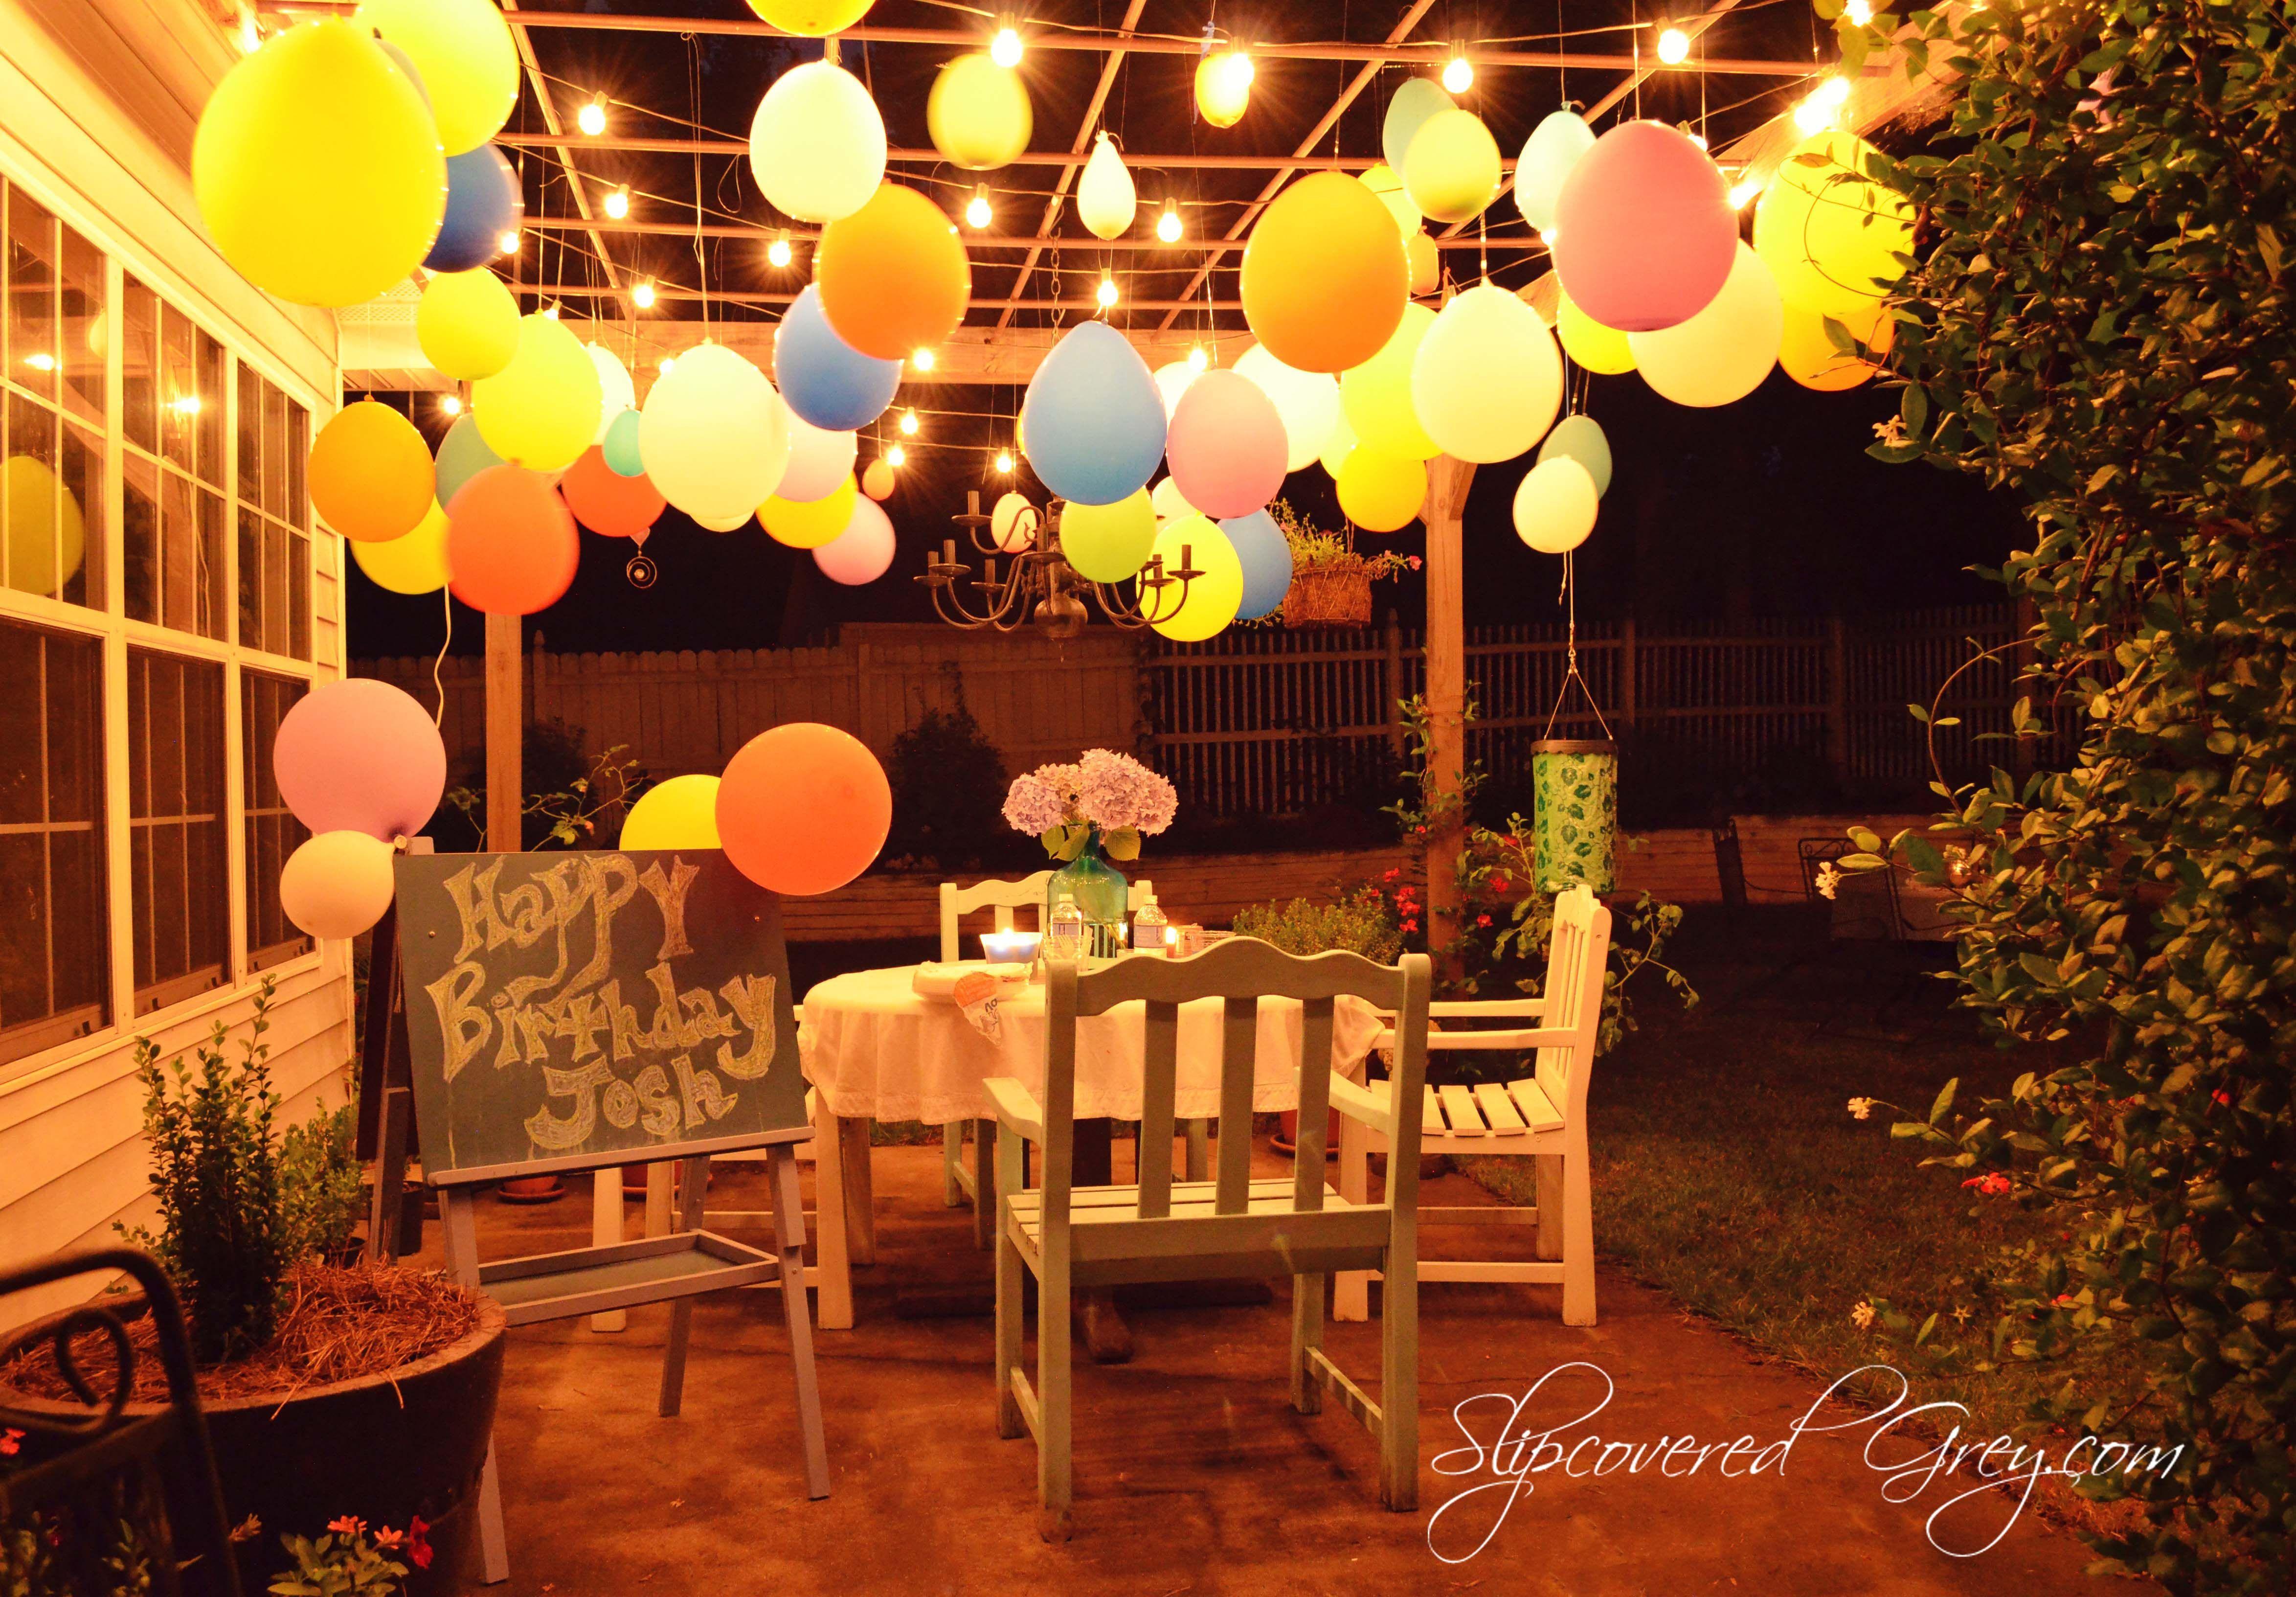 Outdoor Party Lights Outdoor party lights ideas 275 best outdoor party lighting images 50 inspired outdoor party lighting ideas workwithnaturefo